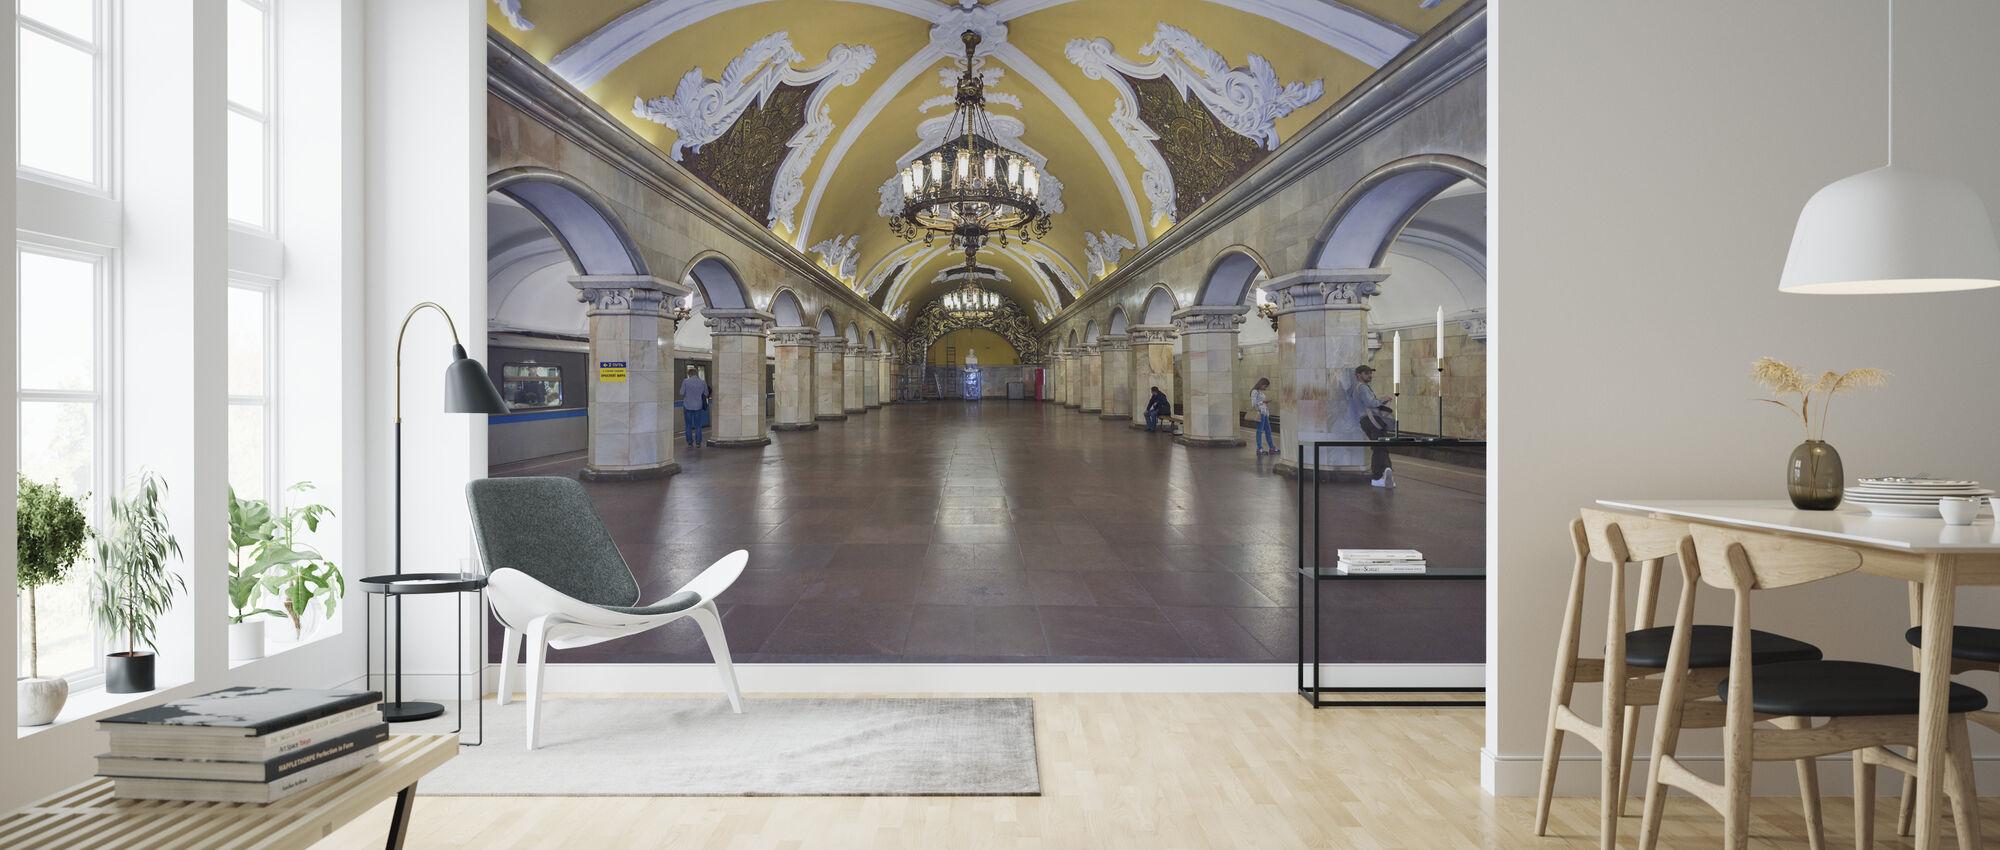 Komsomolskaya Station, Moscow - Wallpaper - Living Room